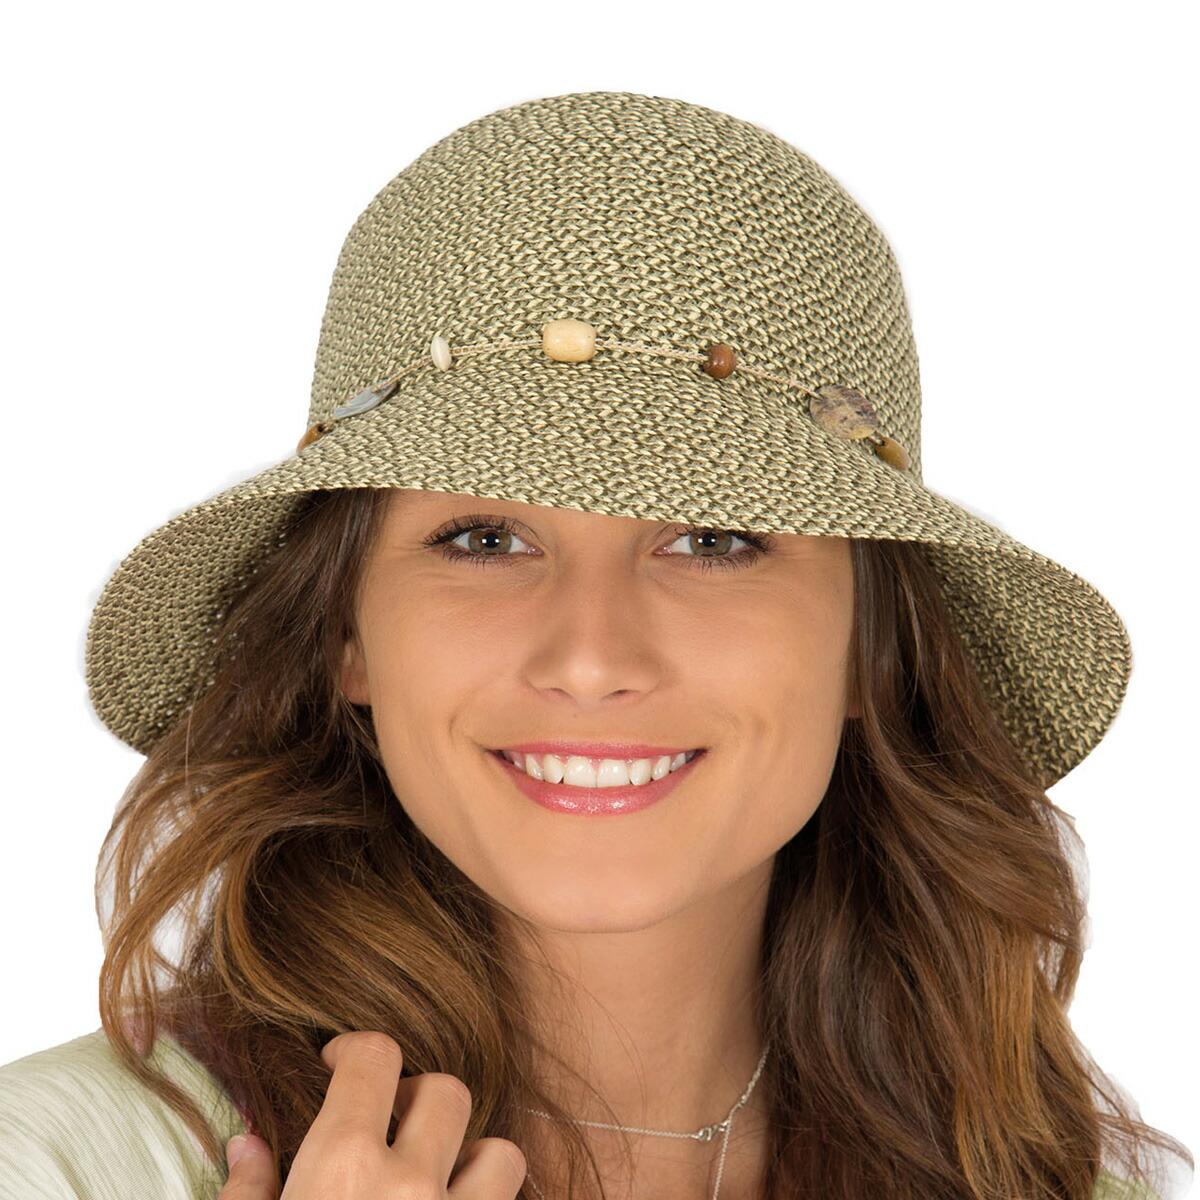 82faf6774a8fd Sunglobe  對像草帽、舒適之帽一樣的UV cut帽子(女性用)-女士帽子 ...